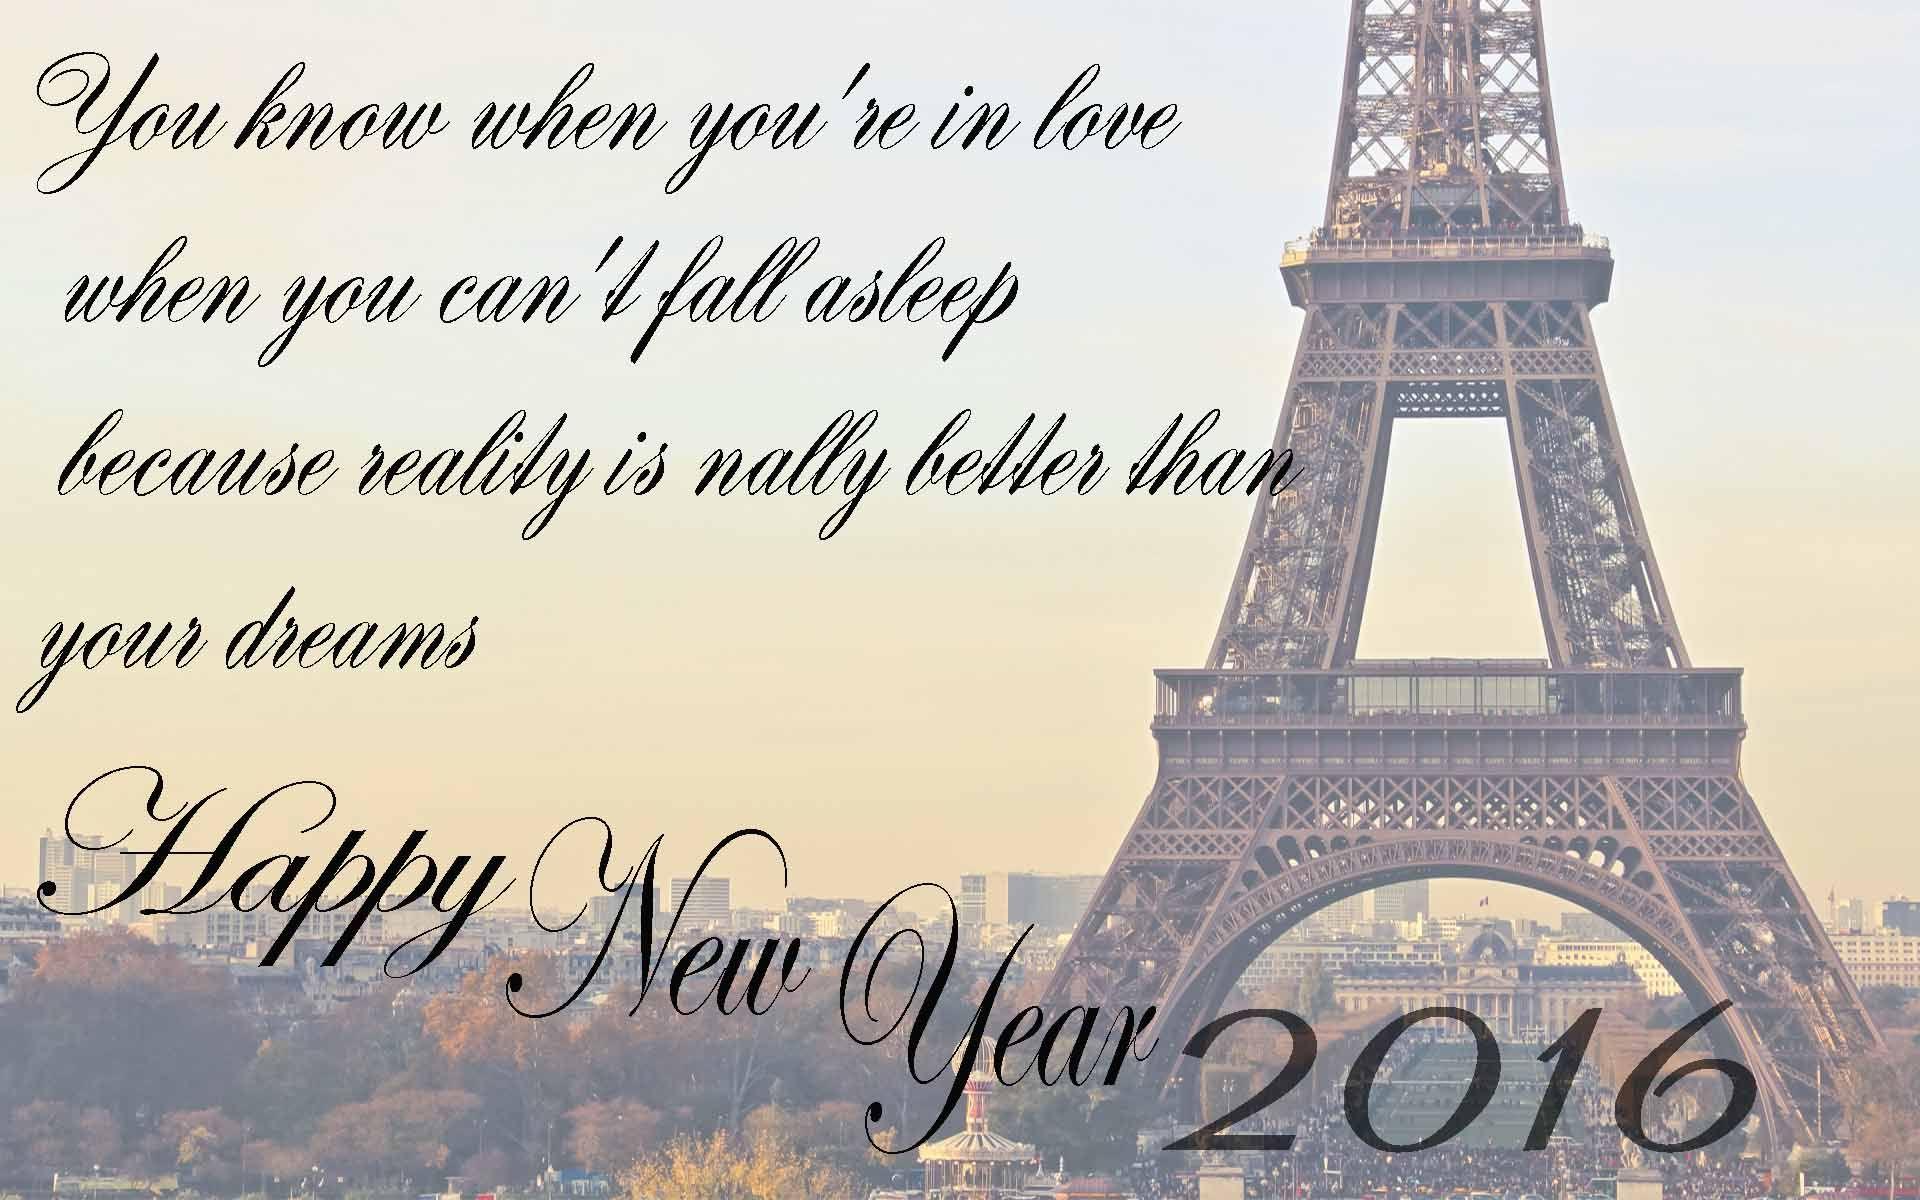 Happy New Year 2016 Love Wallpaper